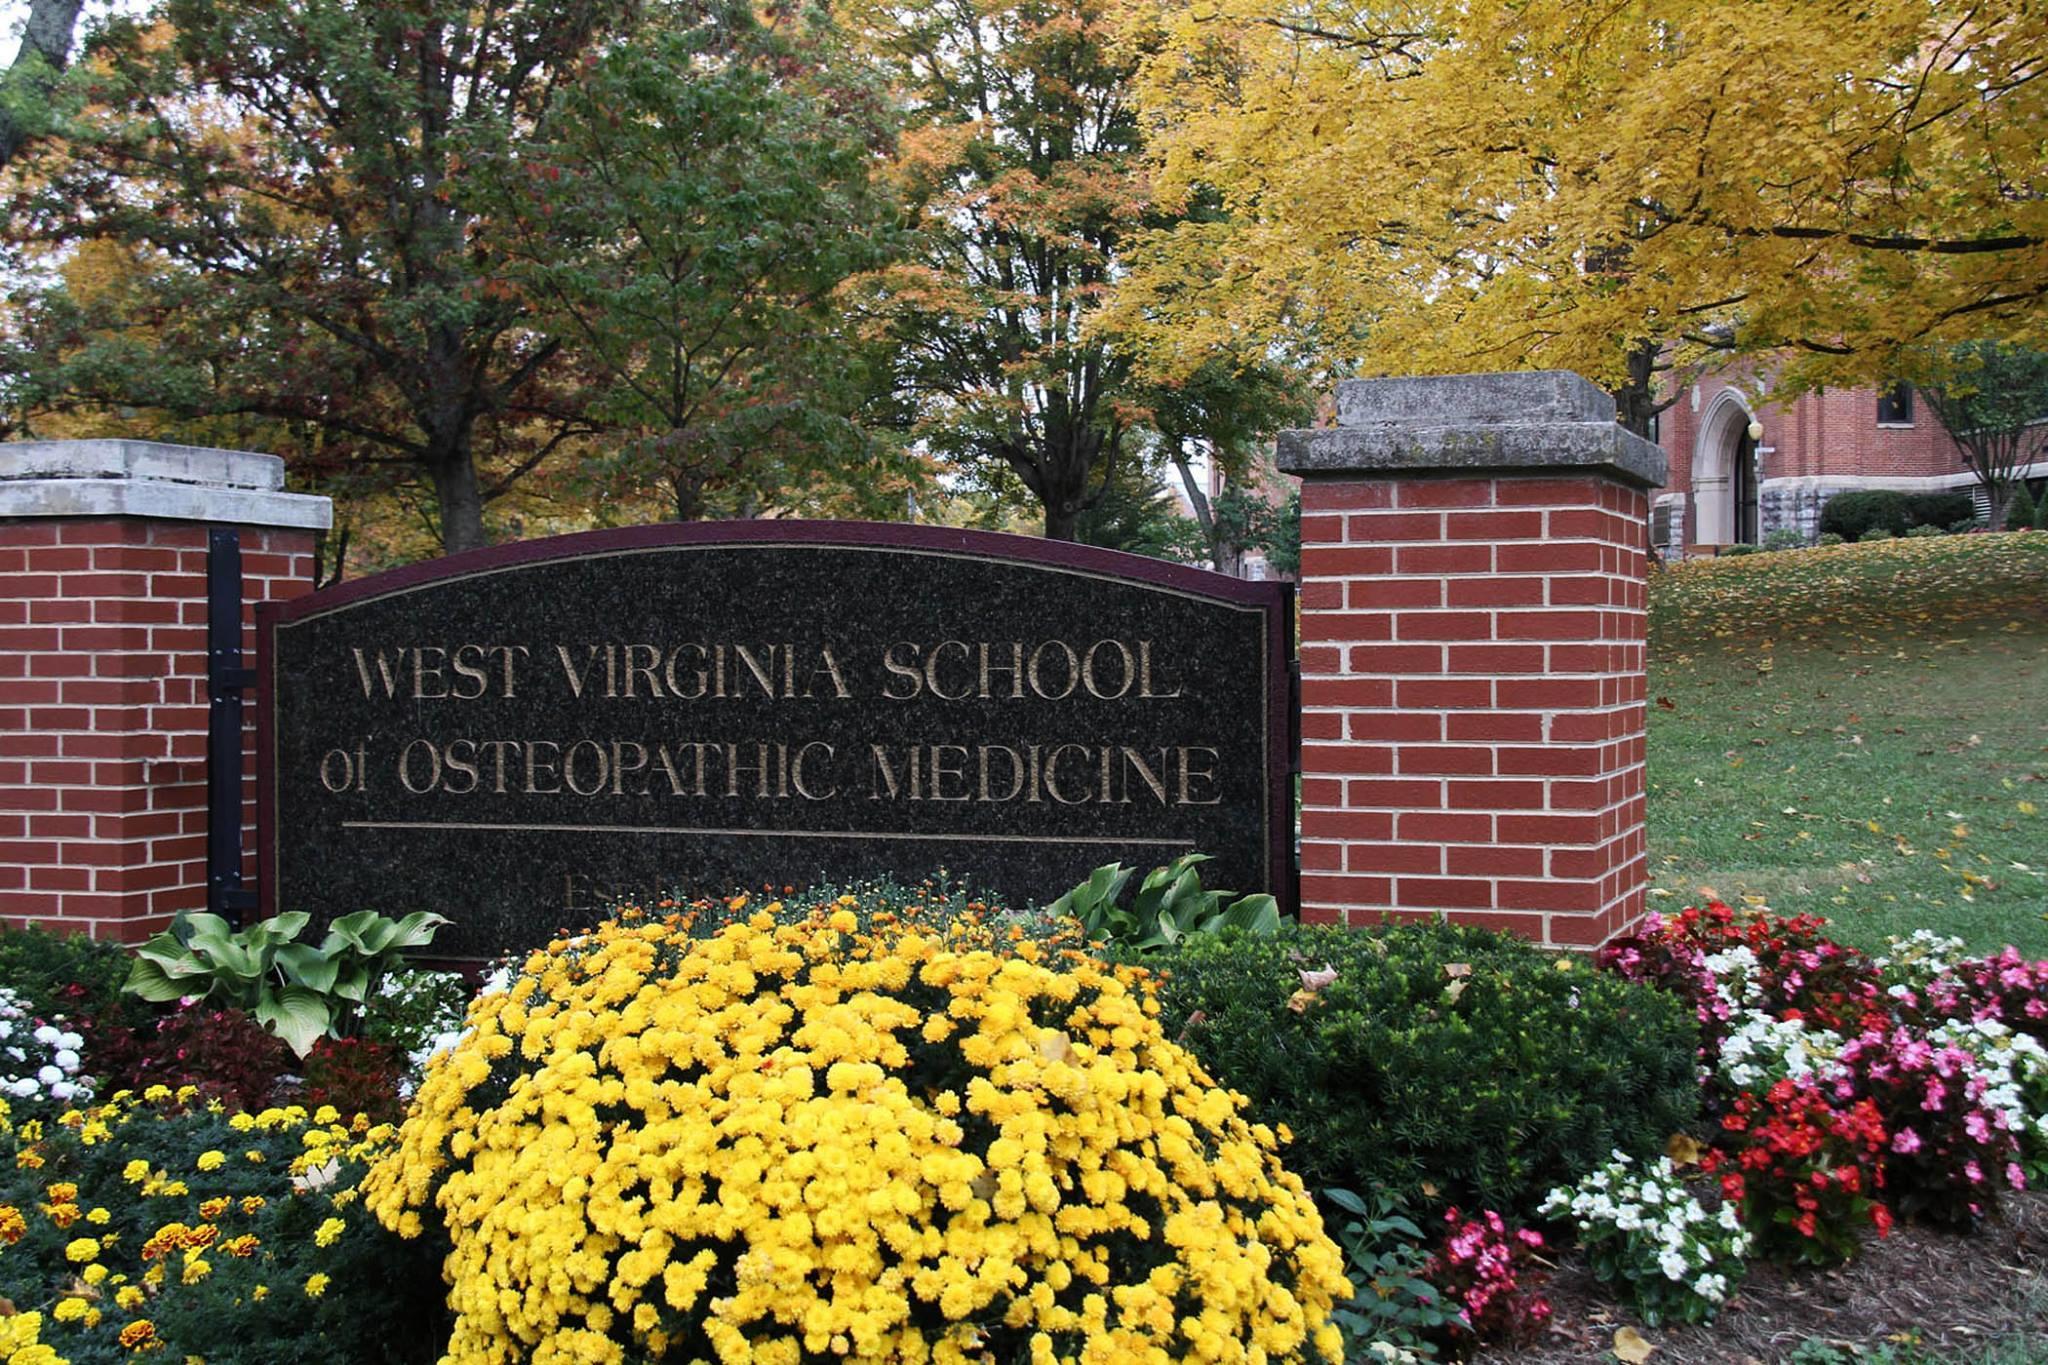 West Virginia School of Osteopathic Medicine image 2